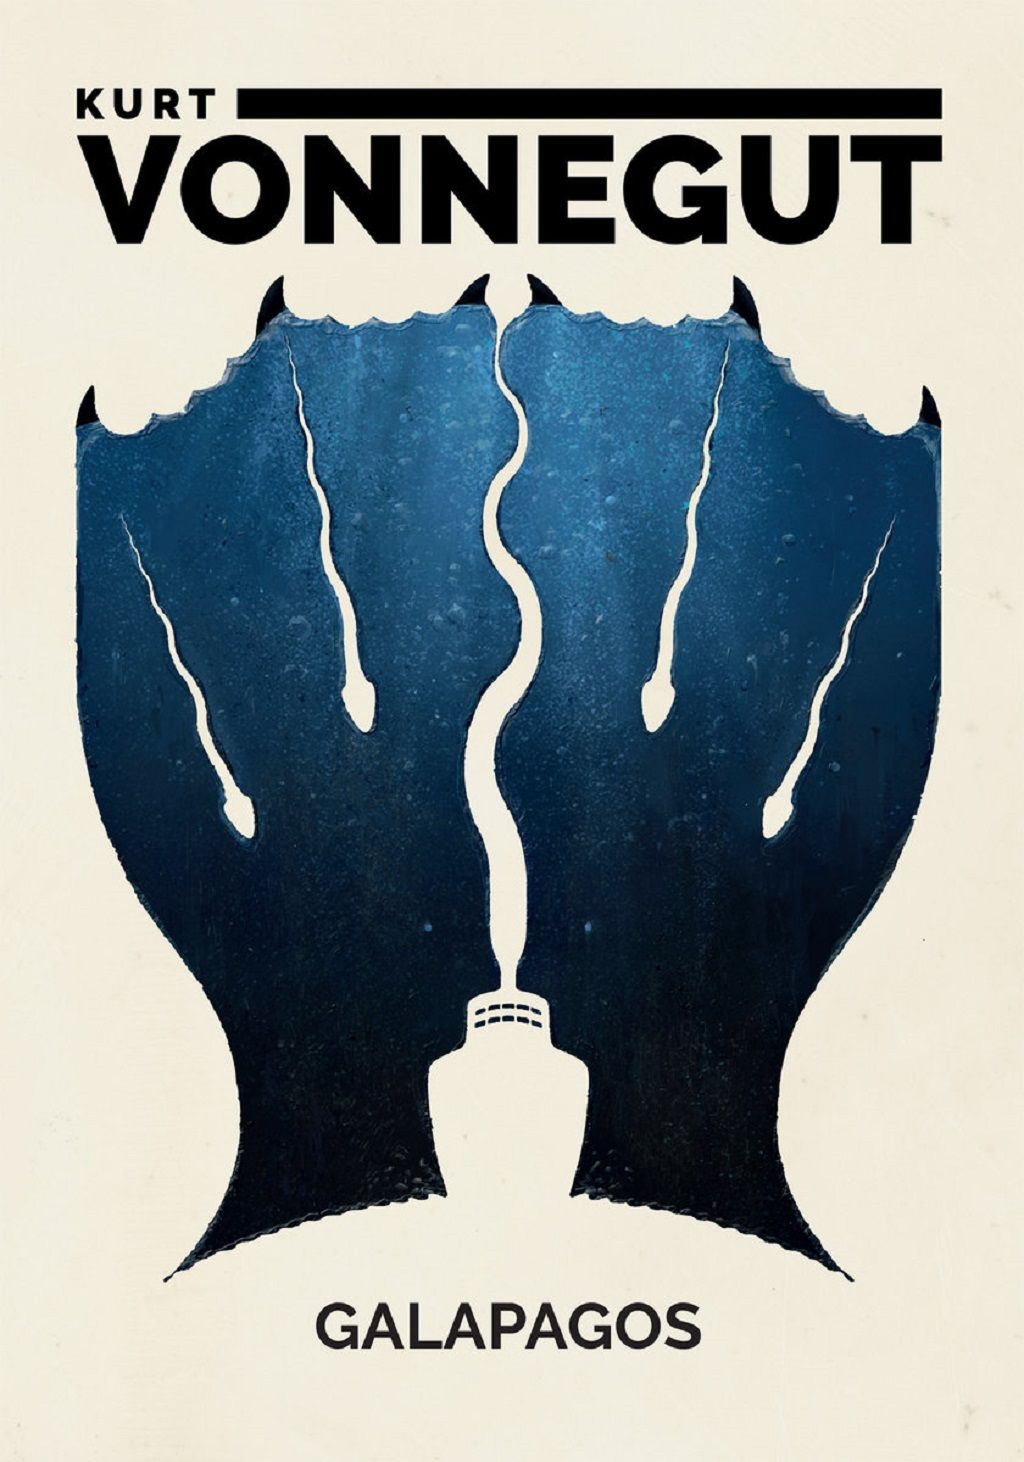 Kurt Vonnegut – Galapagos